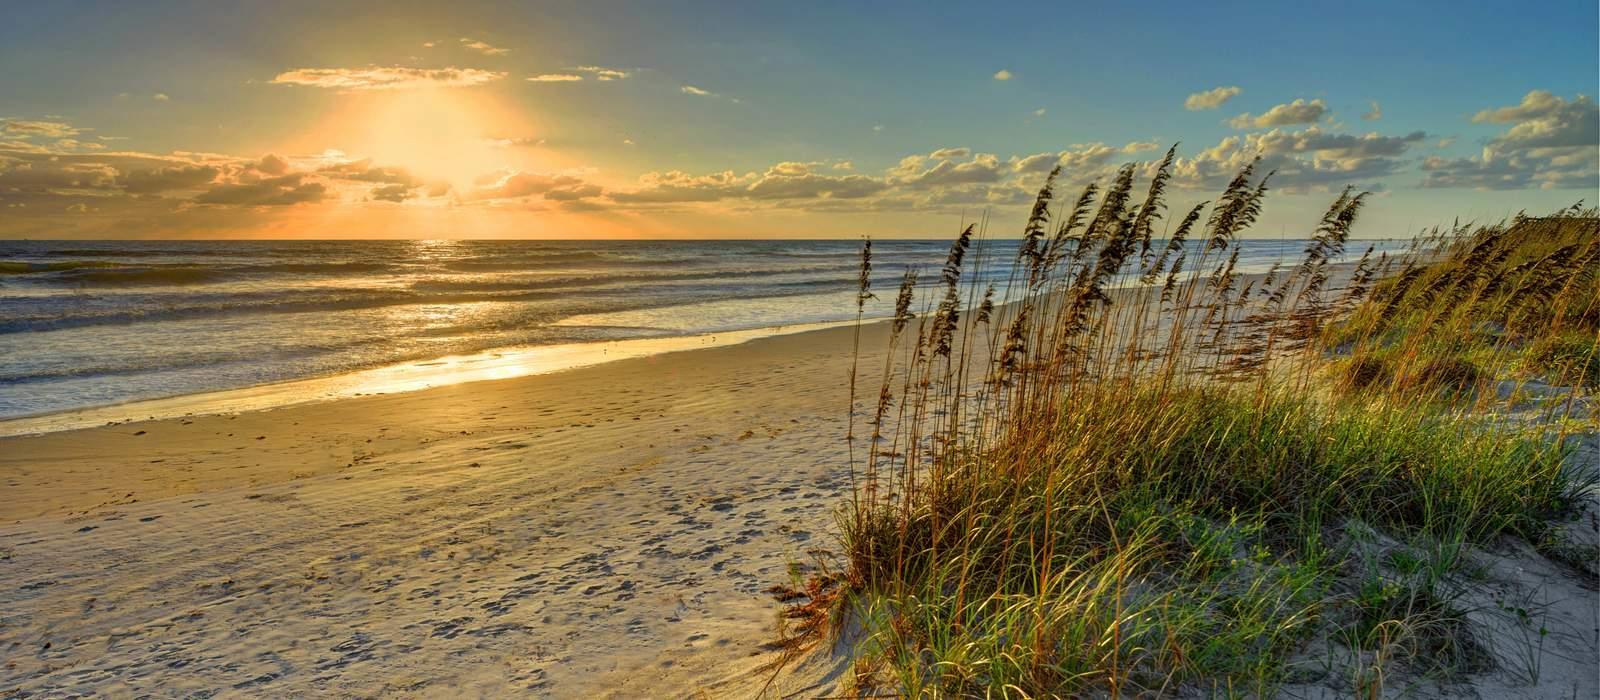 Der Daytona Beach in Florida